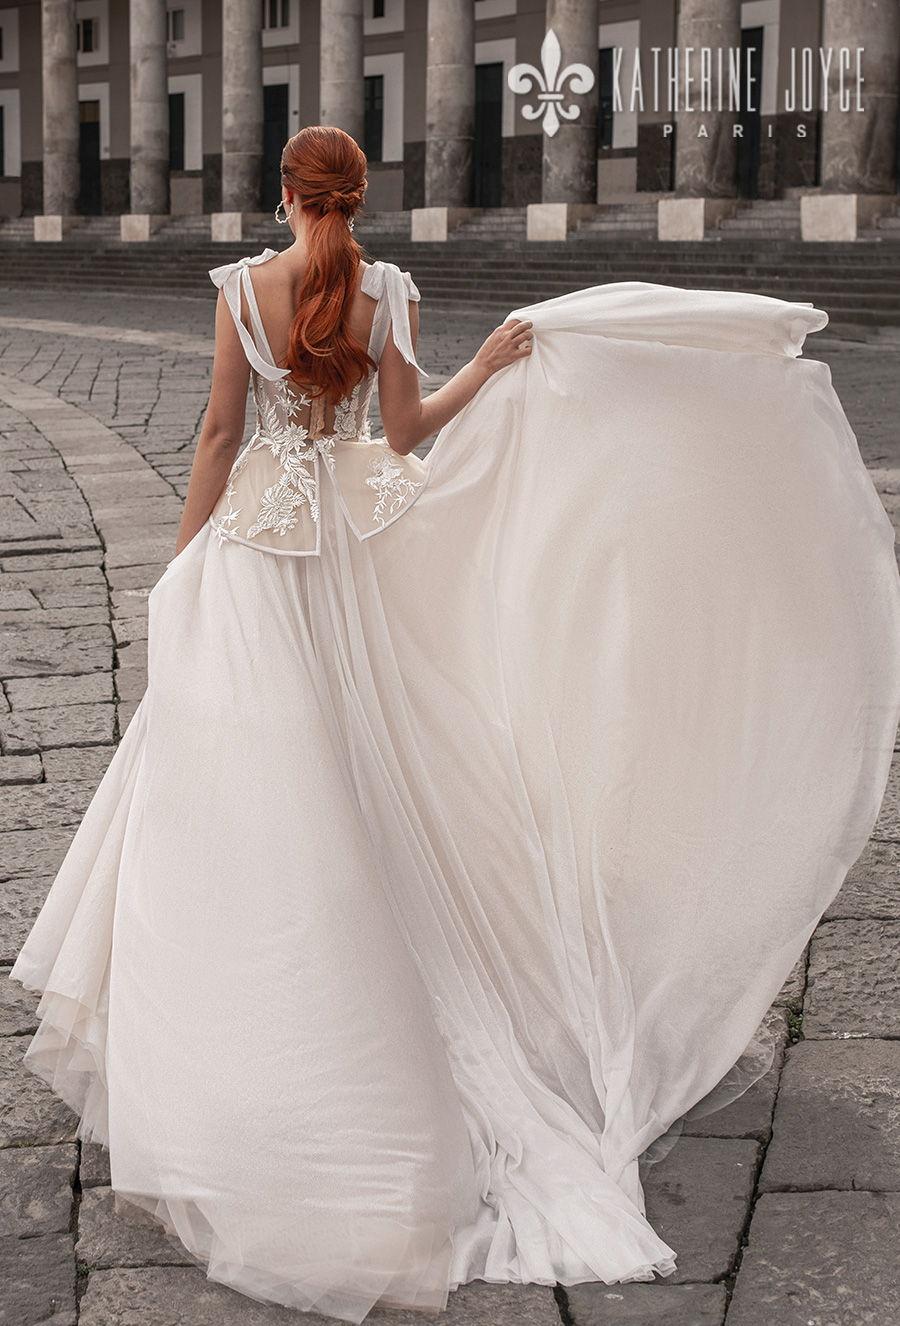 katherine joyce 2021 naples bridal sleeveless ribbon straps sweetheart neckline heavily embellished bodice bustier romantic a line wedding dress mid back chapel train (astraya) bv